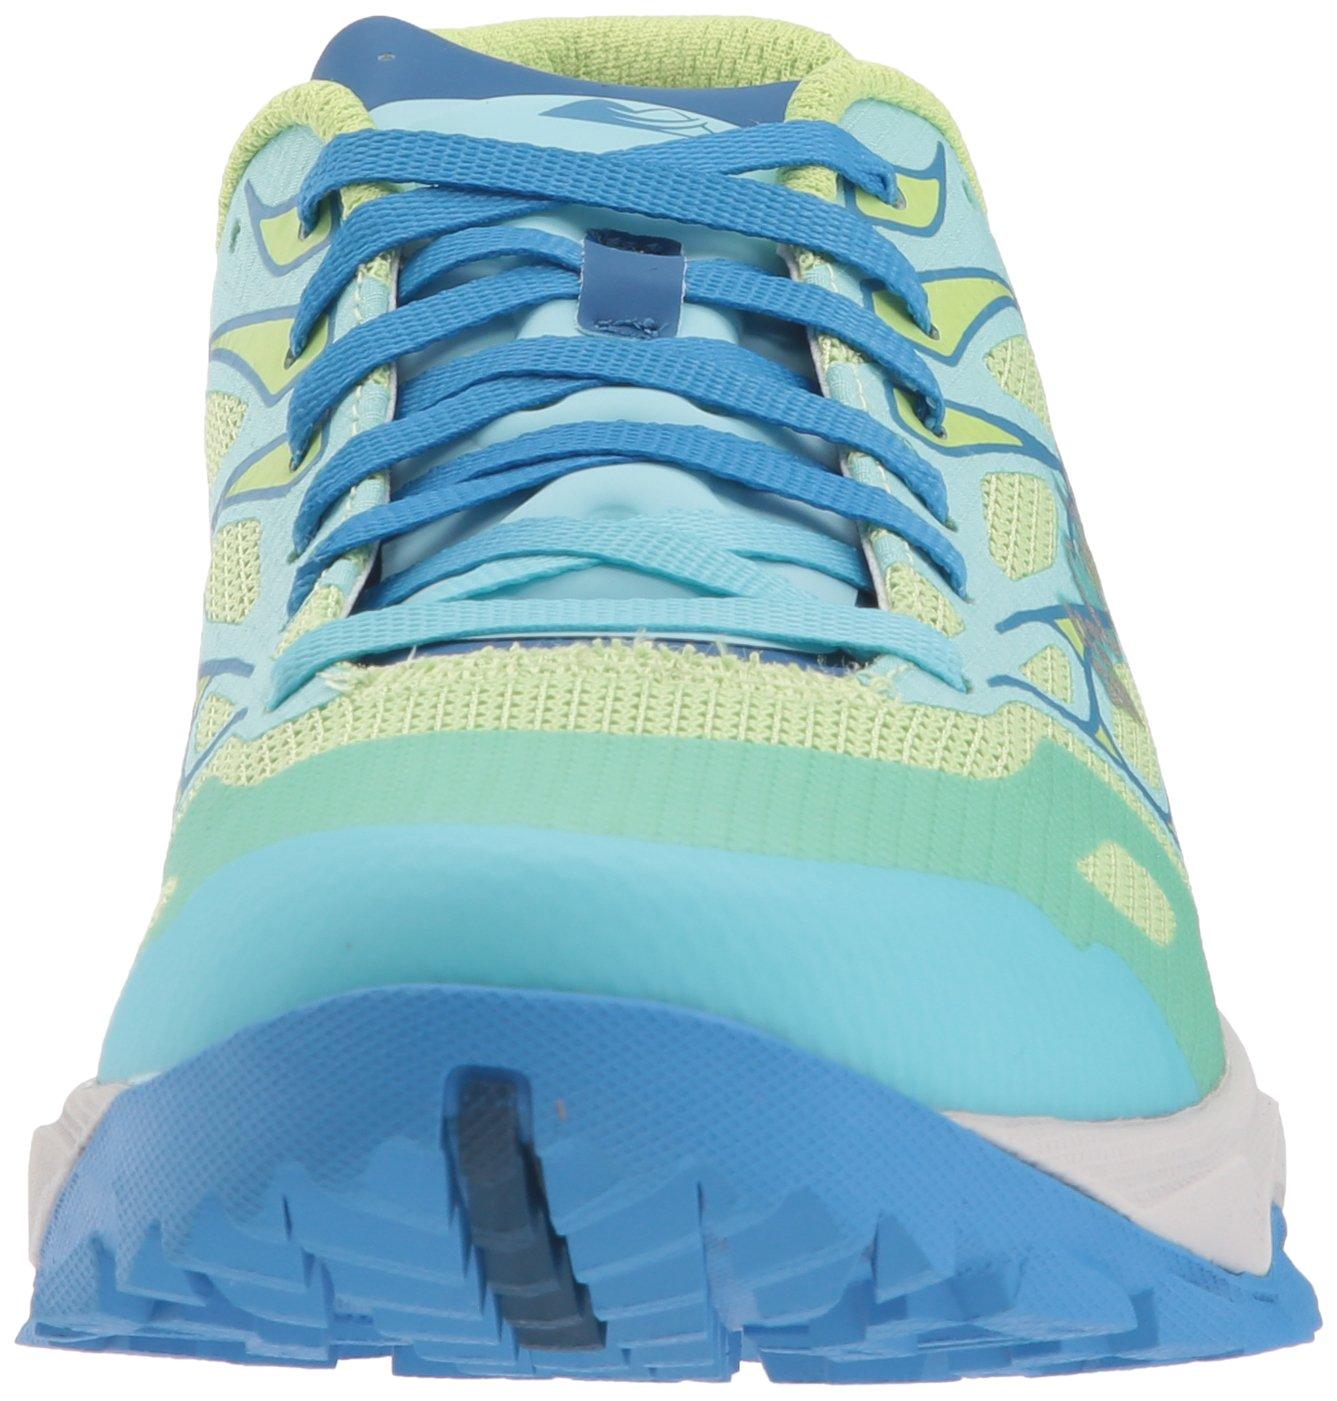 Columbia Montrail Women's Trans Alps F.K.T. II Trail Running Shoe B072WKJ1V3 11 B(M) US|Jade Lime, Splash